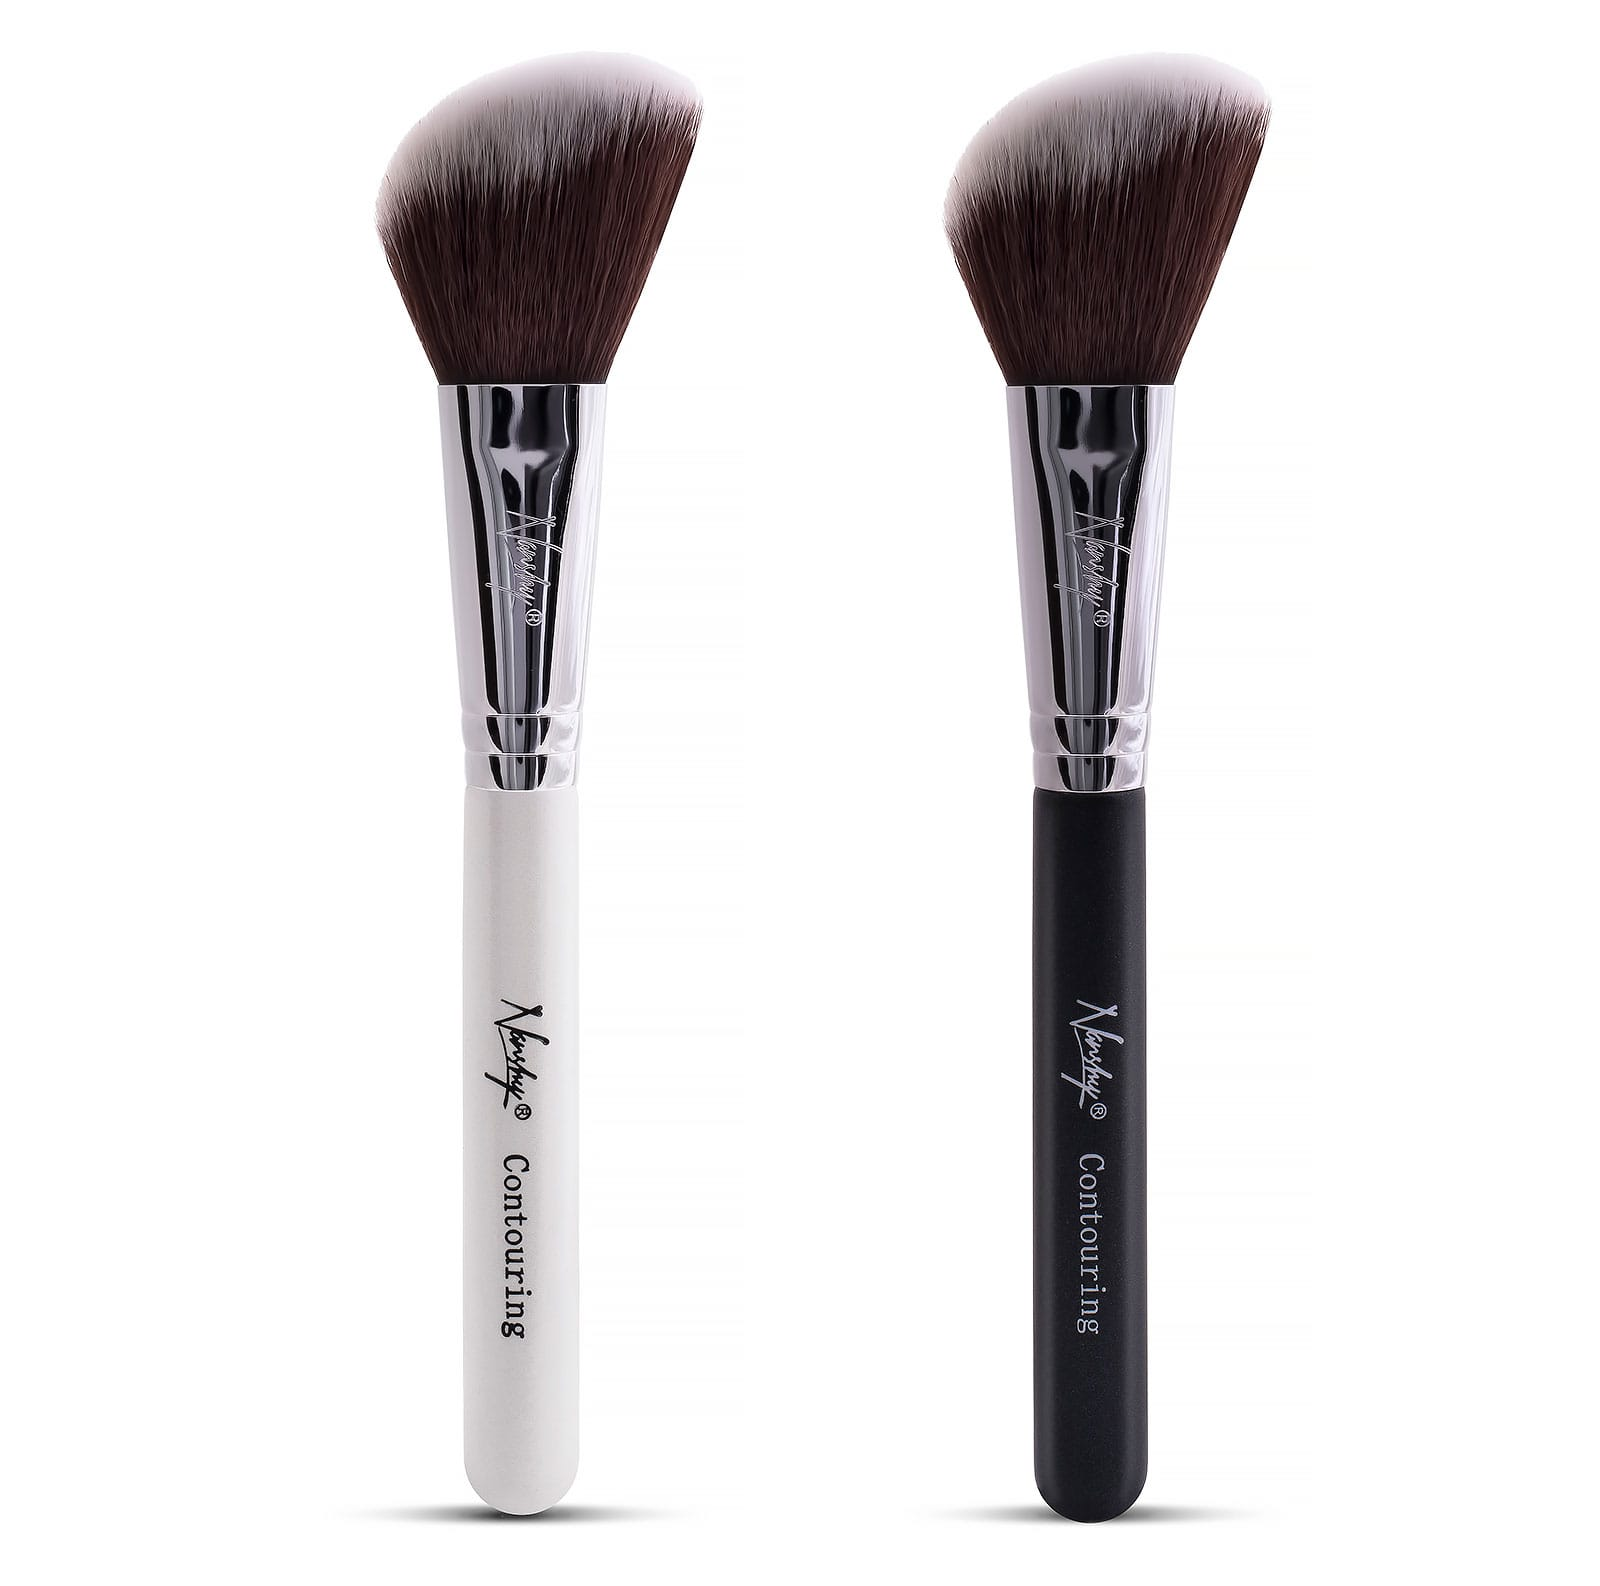 Nanshy Large Angled Contour Makeup Brush ~